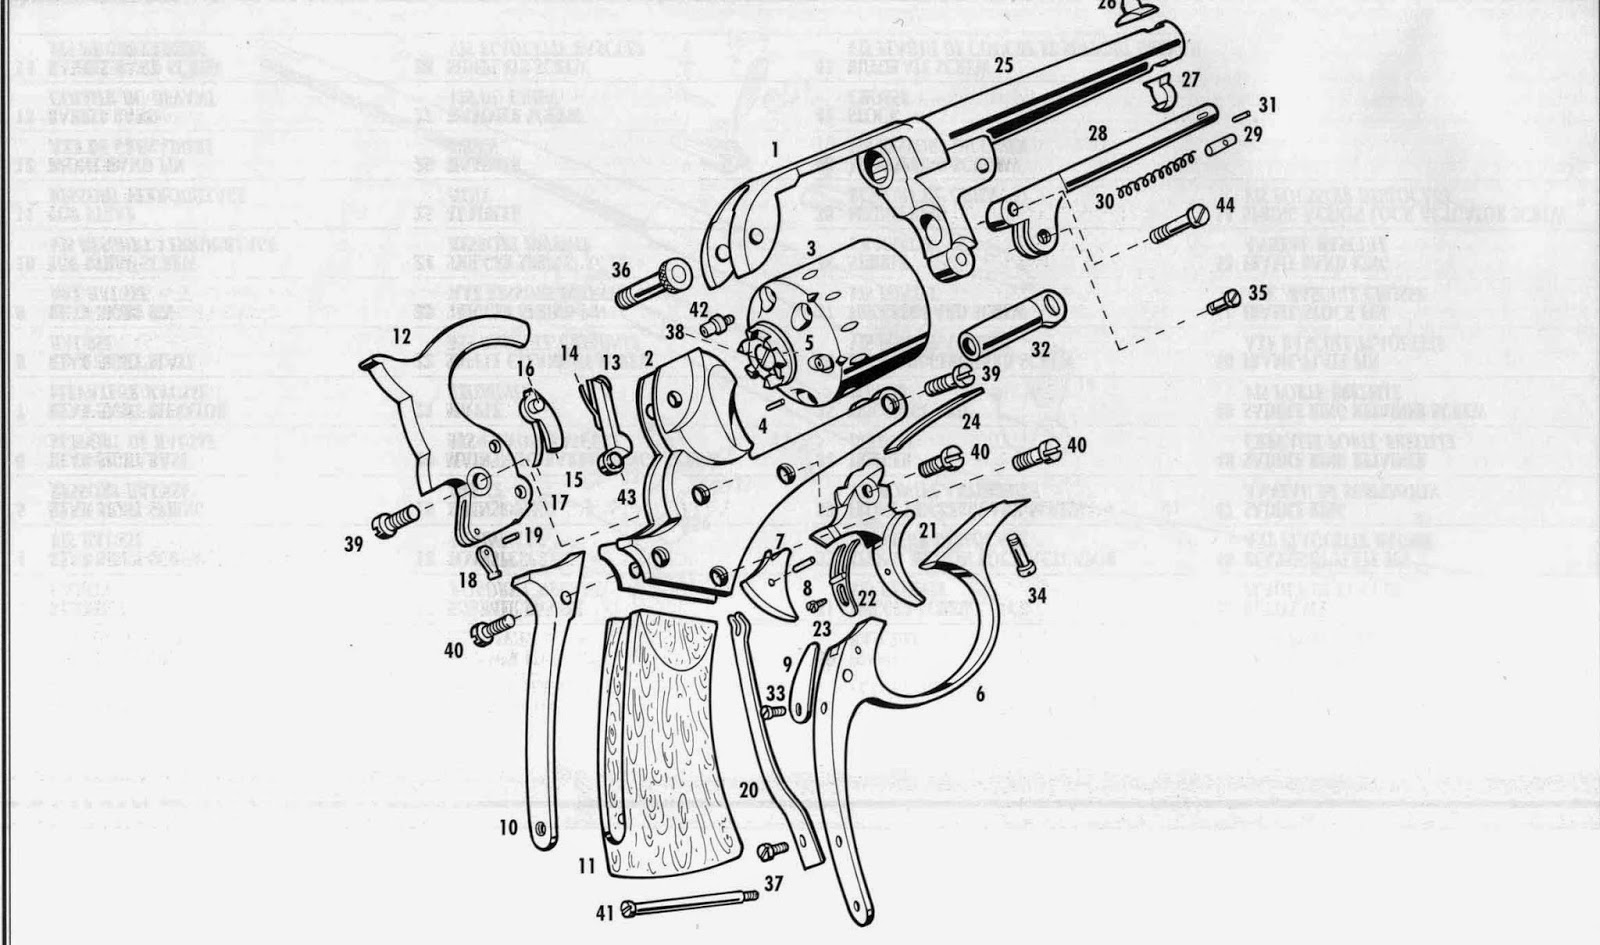 shéma revolver Starr double action 1858